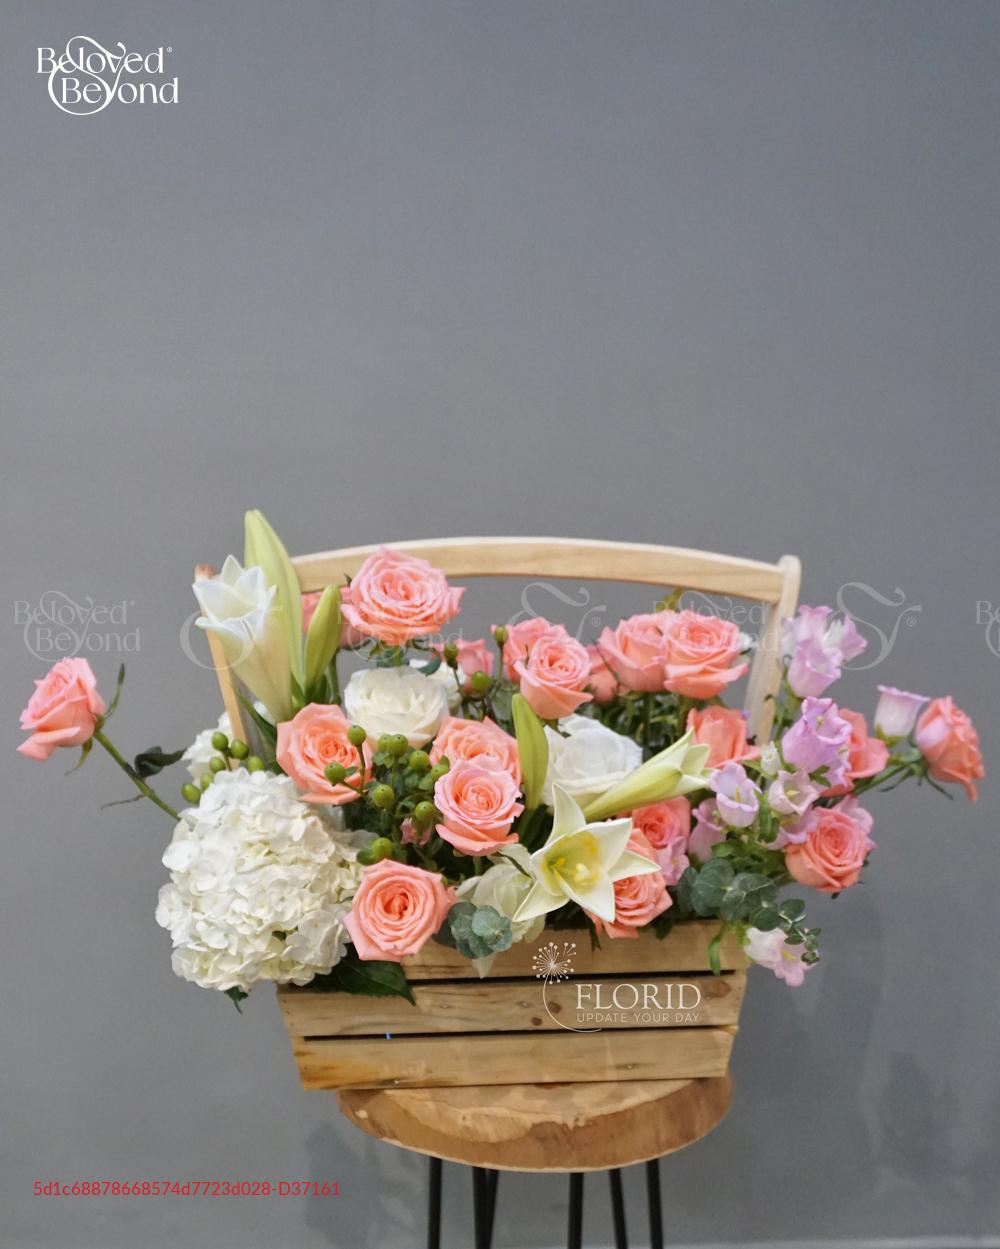 Bó 0204 - D37161 - xinhtuoi.online